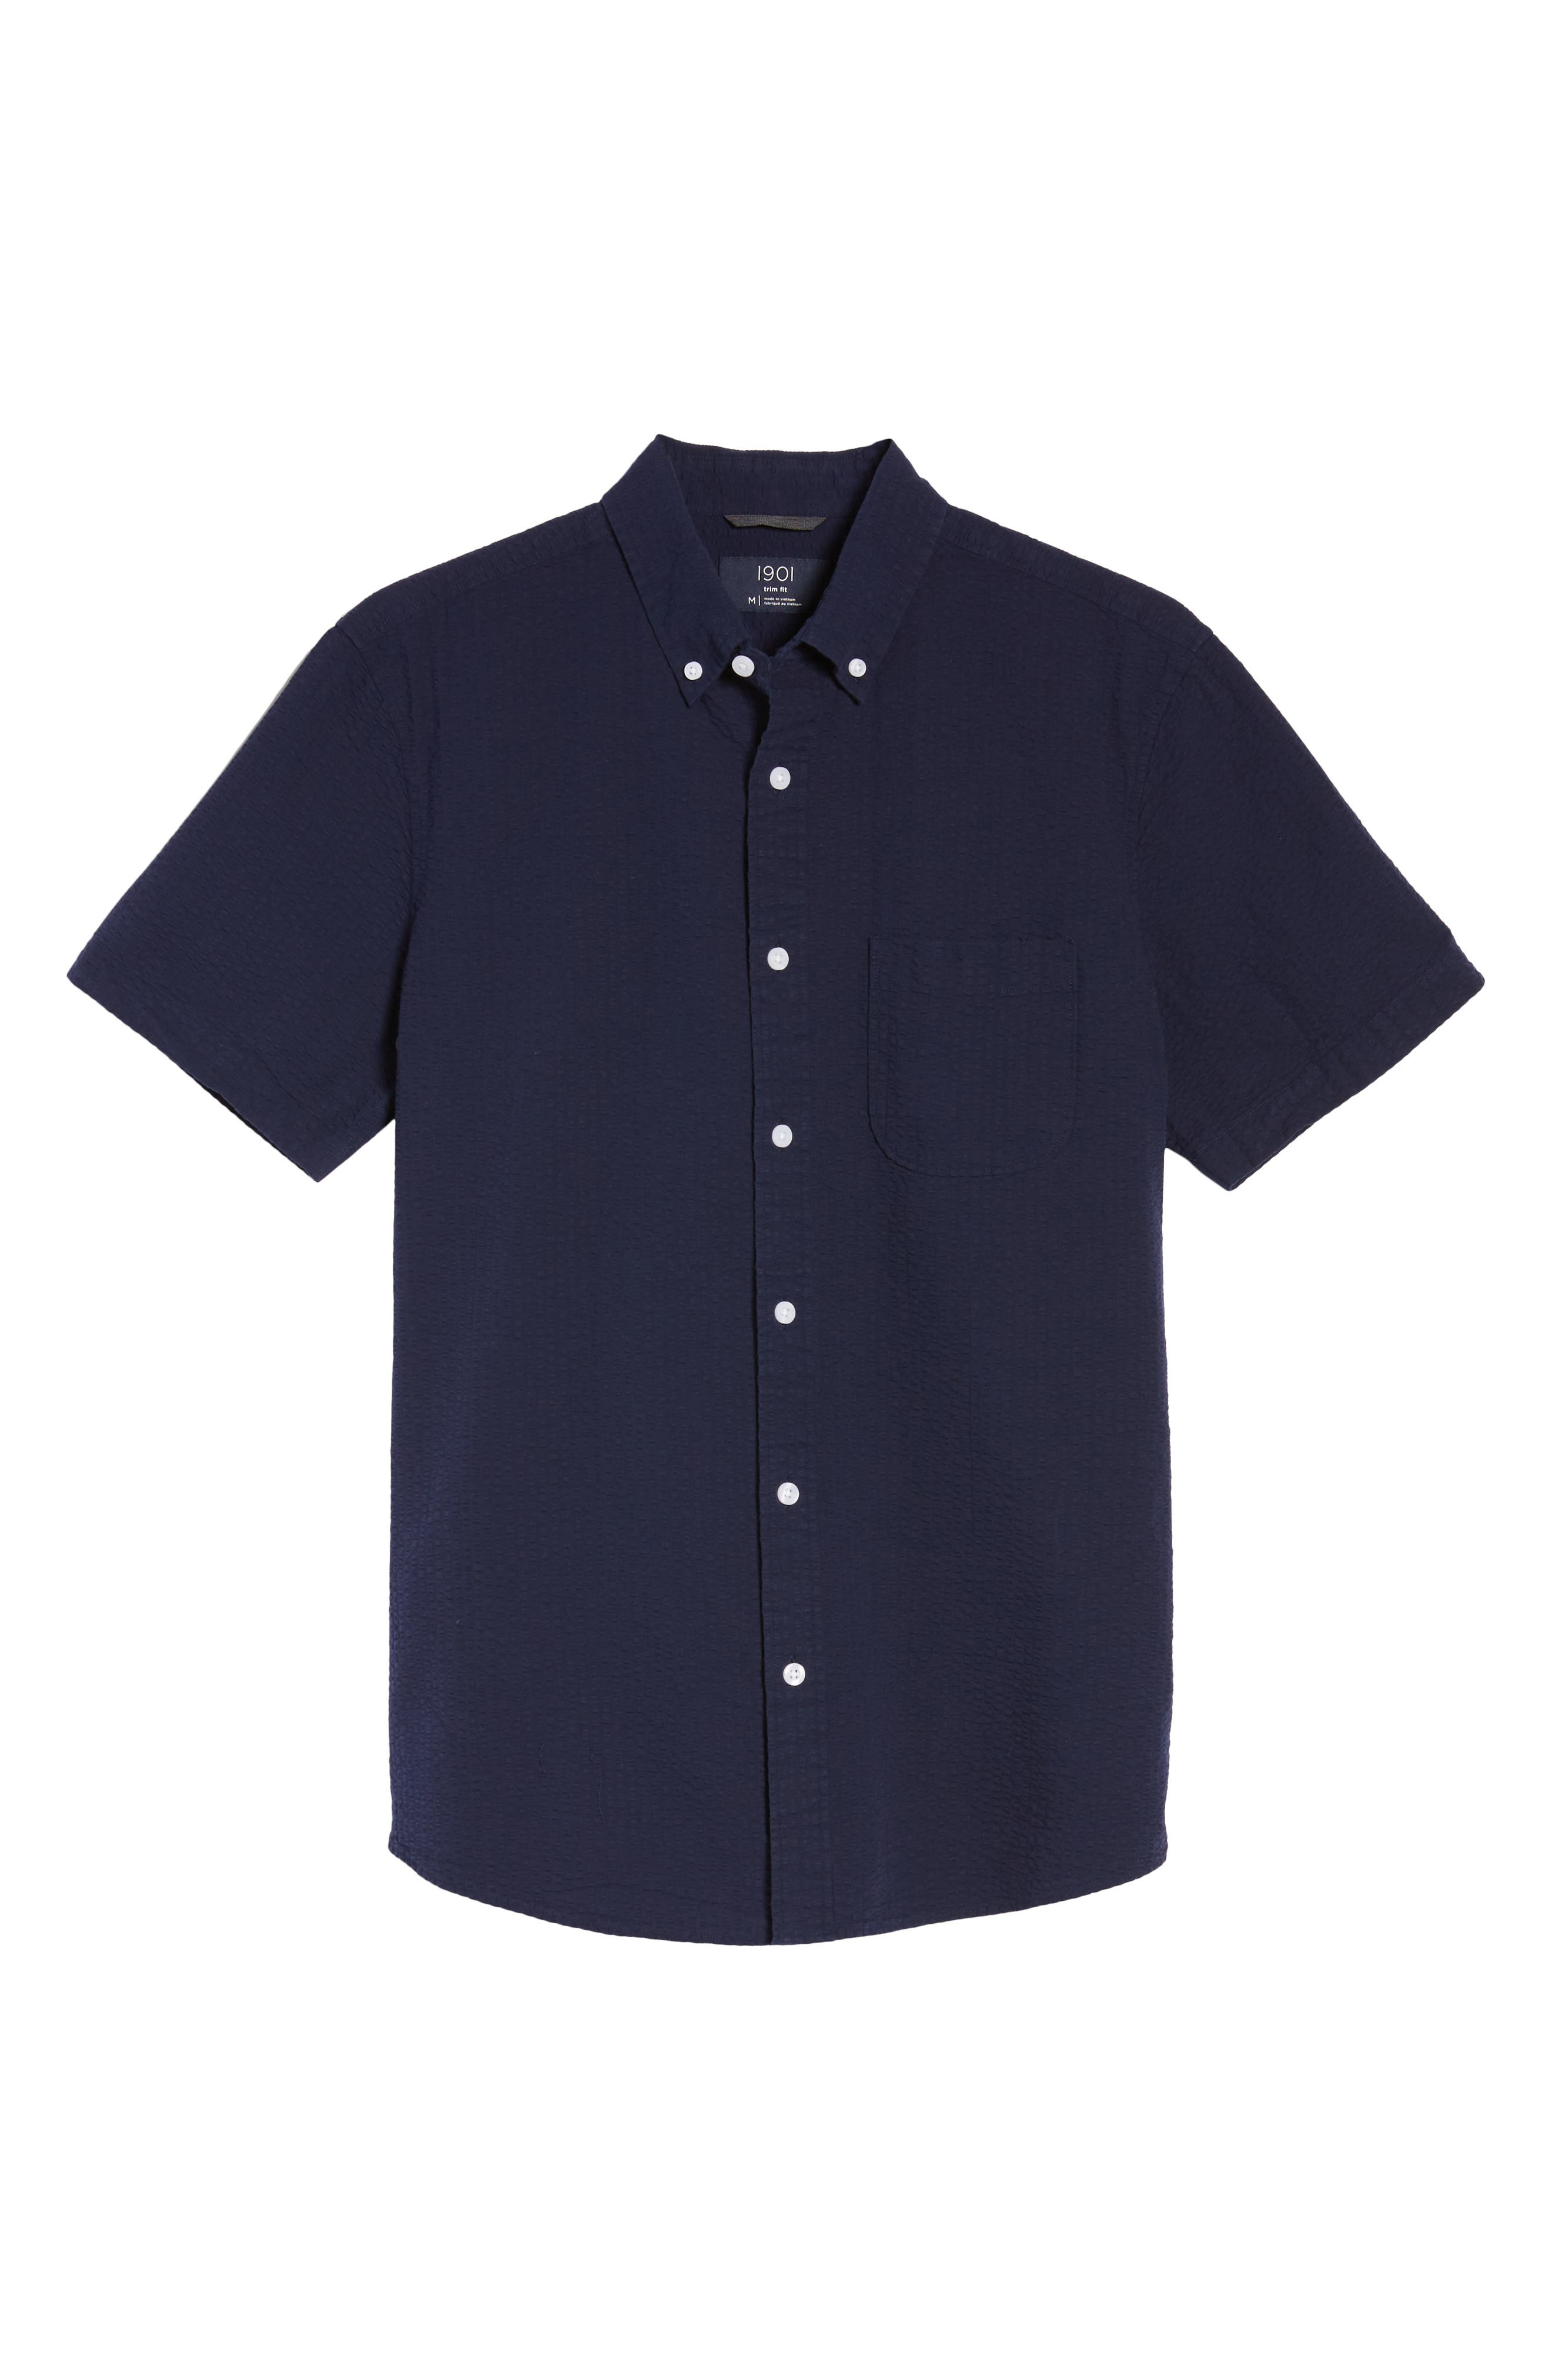 Trim Fit Seersucker Sport Shirt,                             Alternate thumbnail 6, color,                             Navy Iris Seersucker